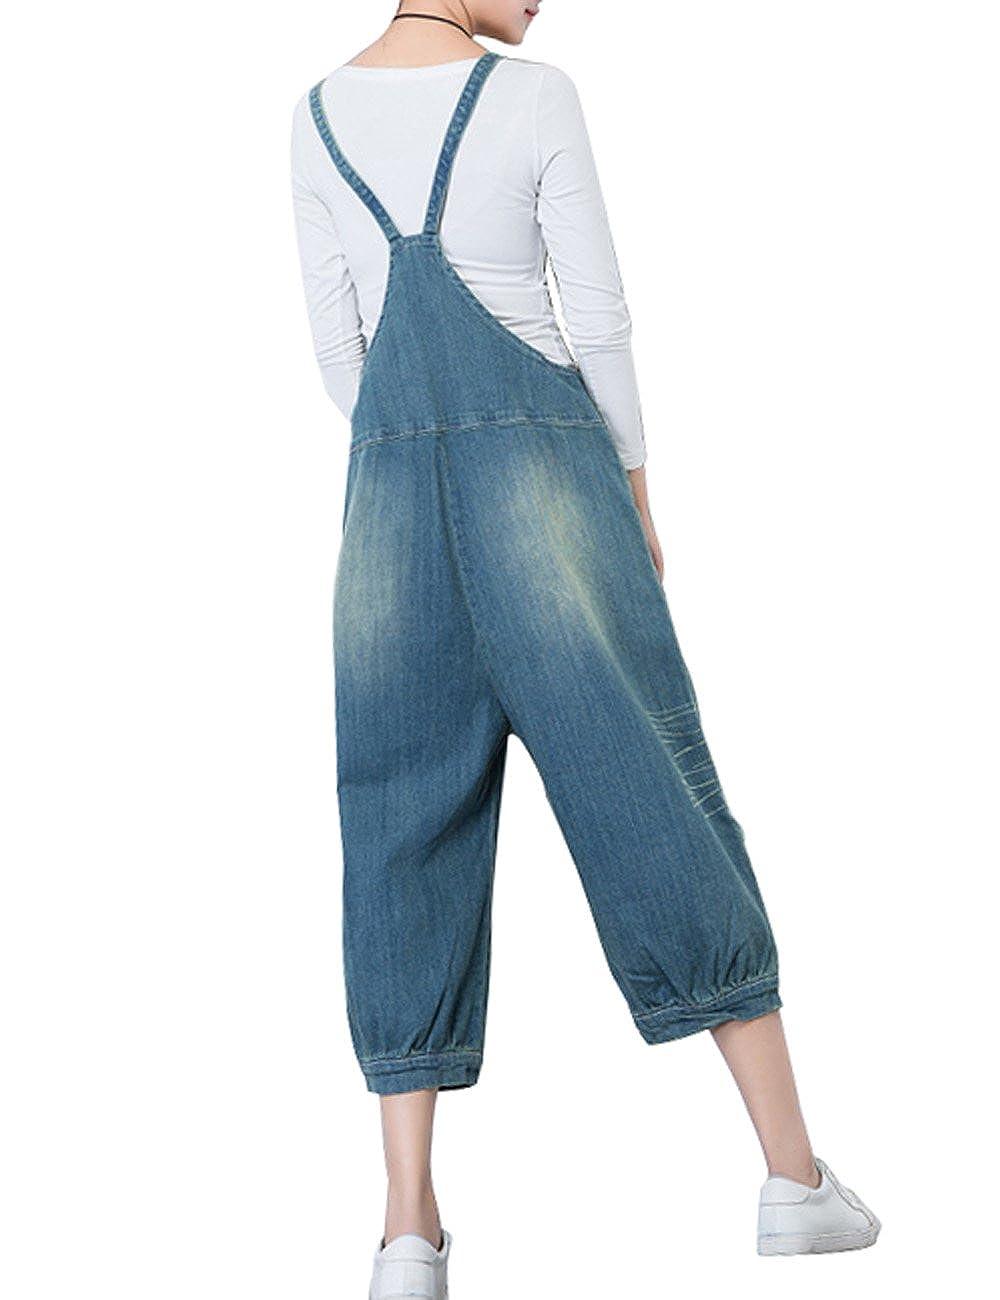 Zoulee Womens Casual Cowboy Pants Bib Overalls Zipper Jumpsuits Rompers Pants